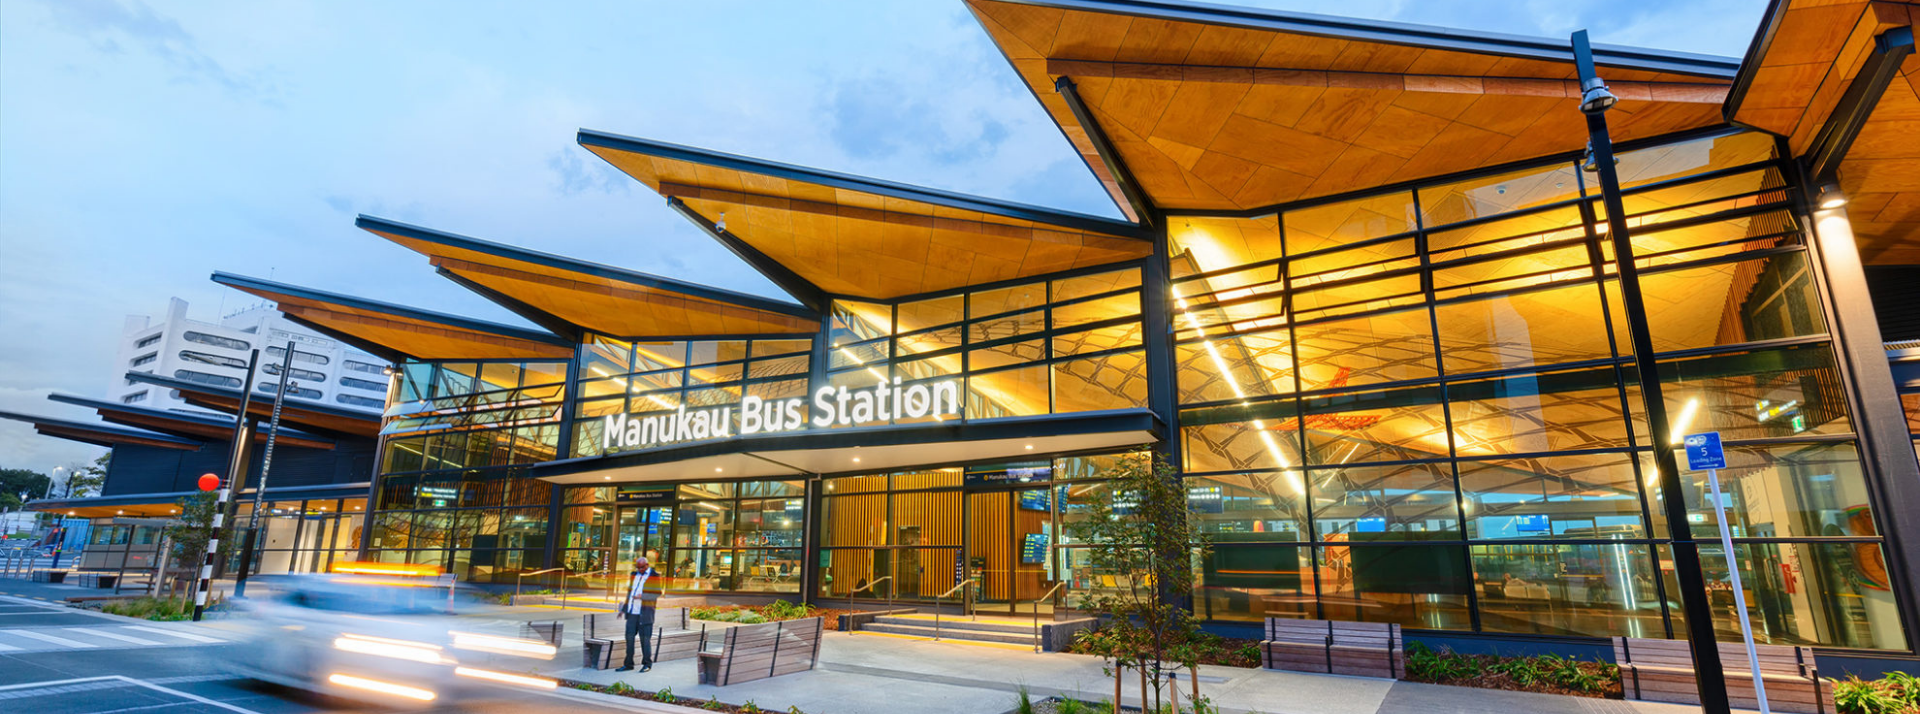 Manukau Bus & Train Interchange